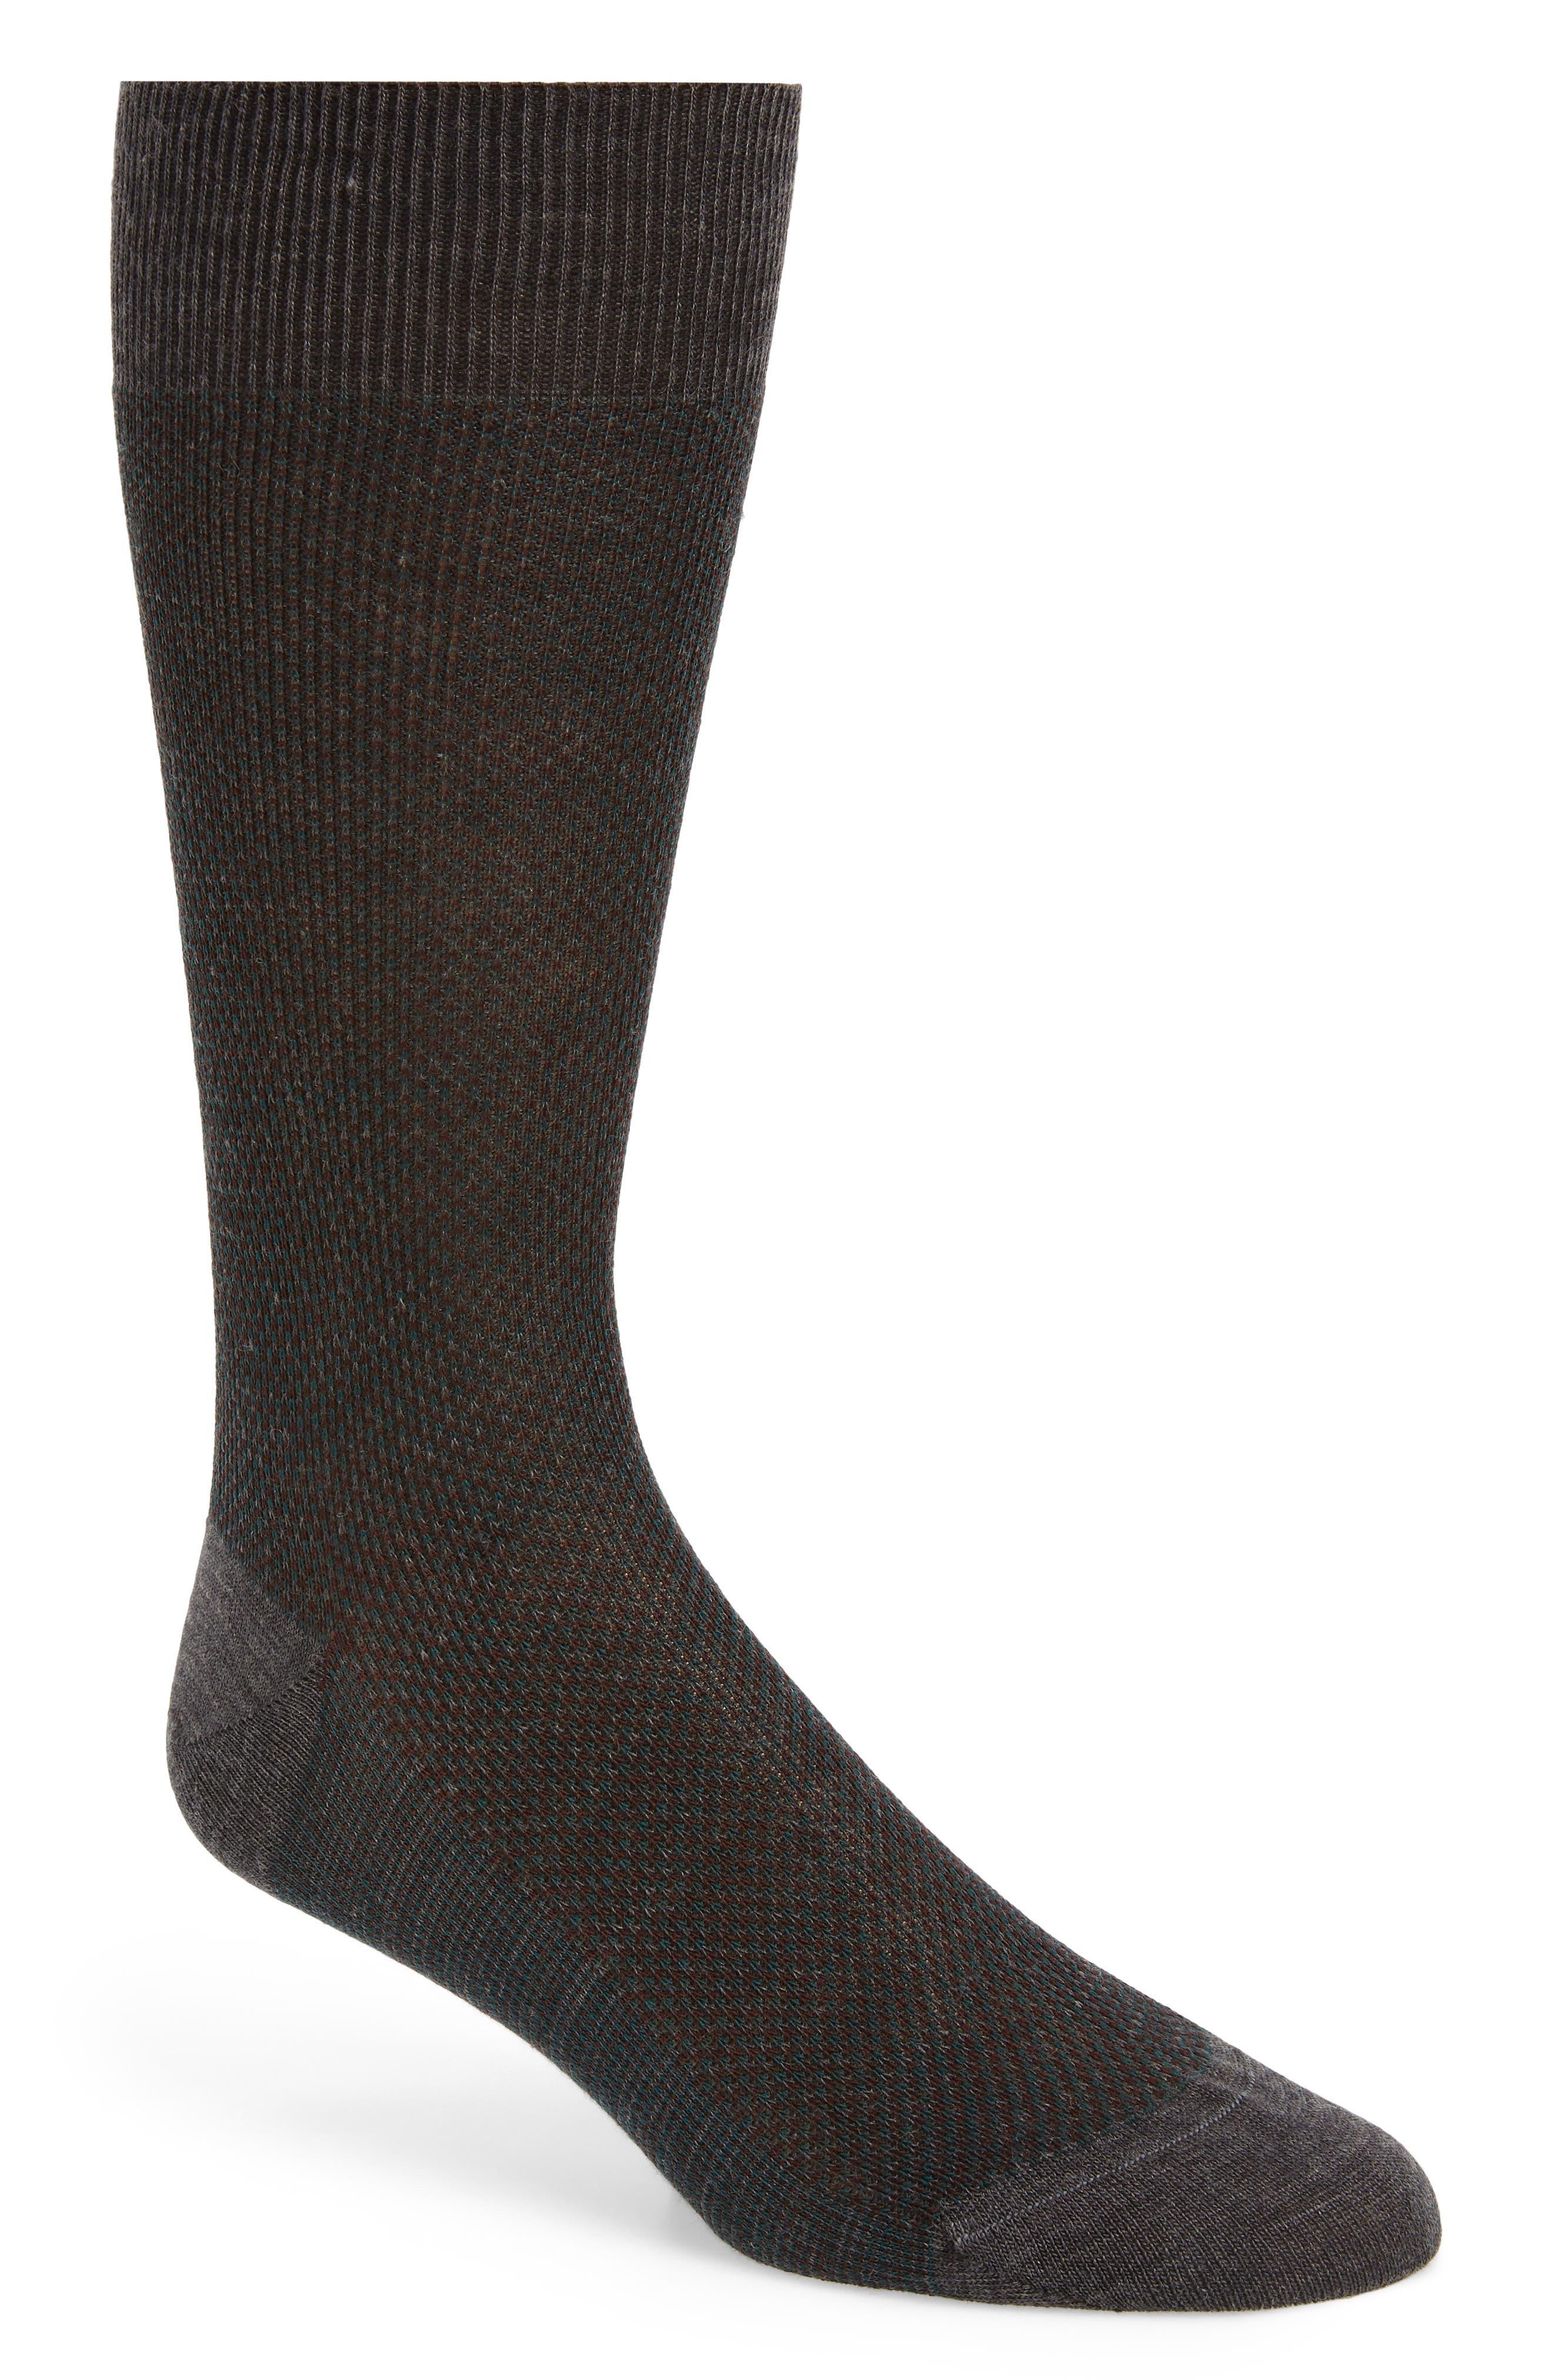 'Vintage Collection - Blenheim' Merino Wool Blend Socks,                             Main thumbnail 1, color,                             NEW DARK GREY MIX